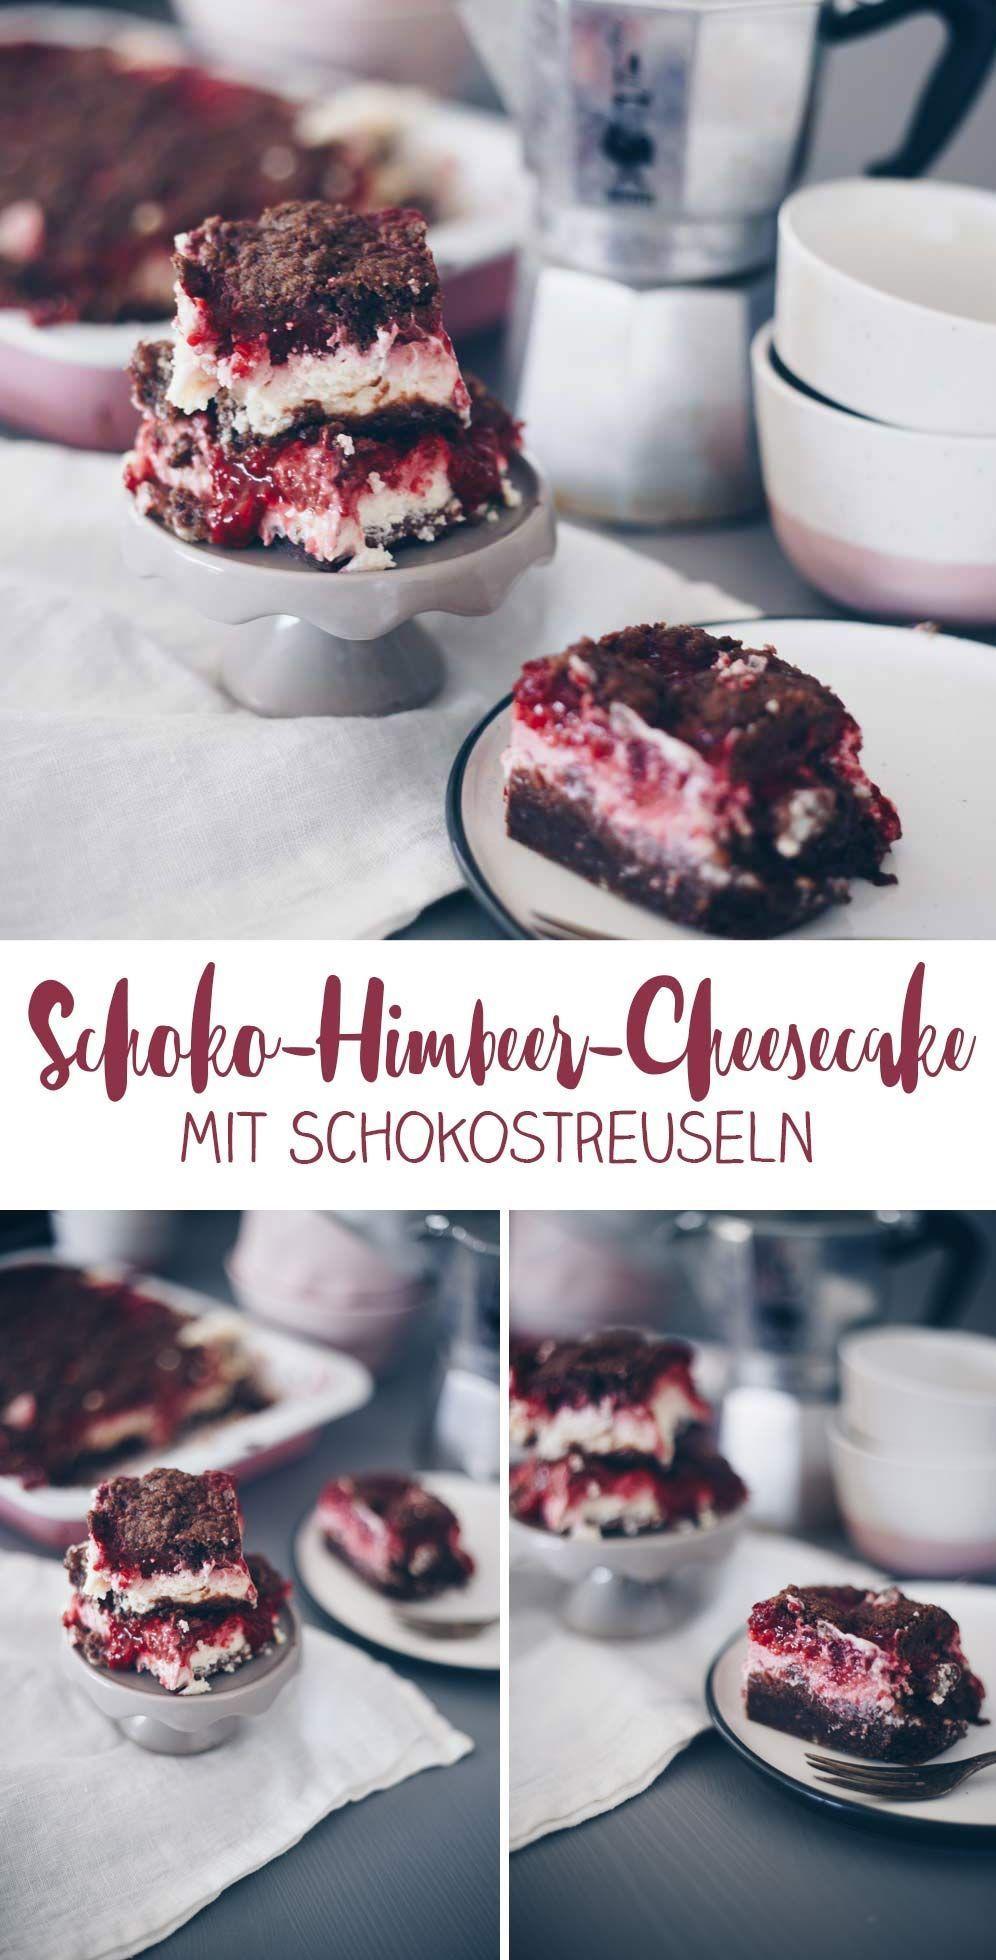 Bake chocolate and raspberry cheesecake with chocolate sprinkles - recipe idea#bake #cheesecake #chocolate #idea #raspberry #recipe #sprinkles